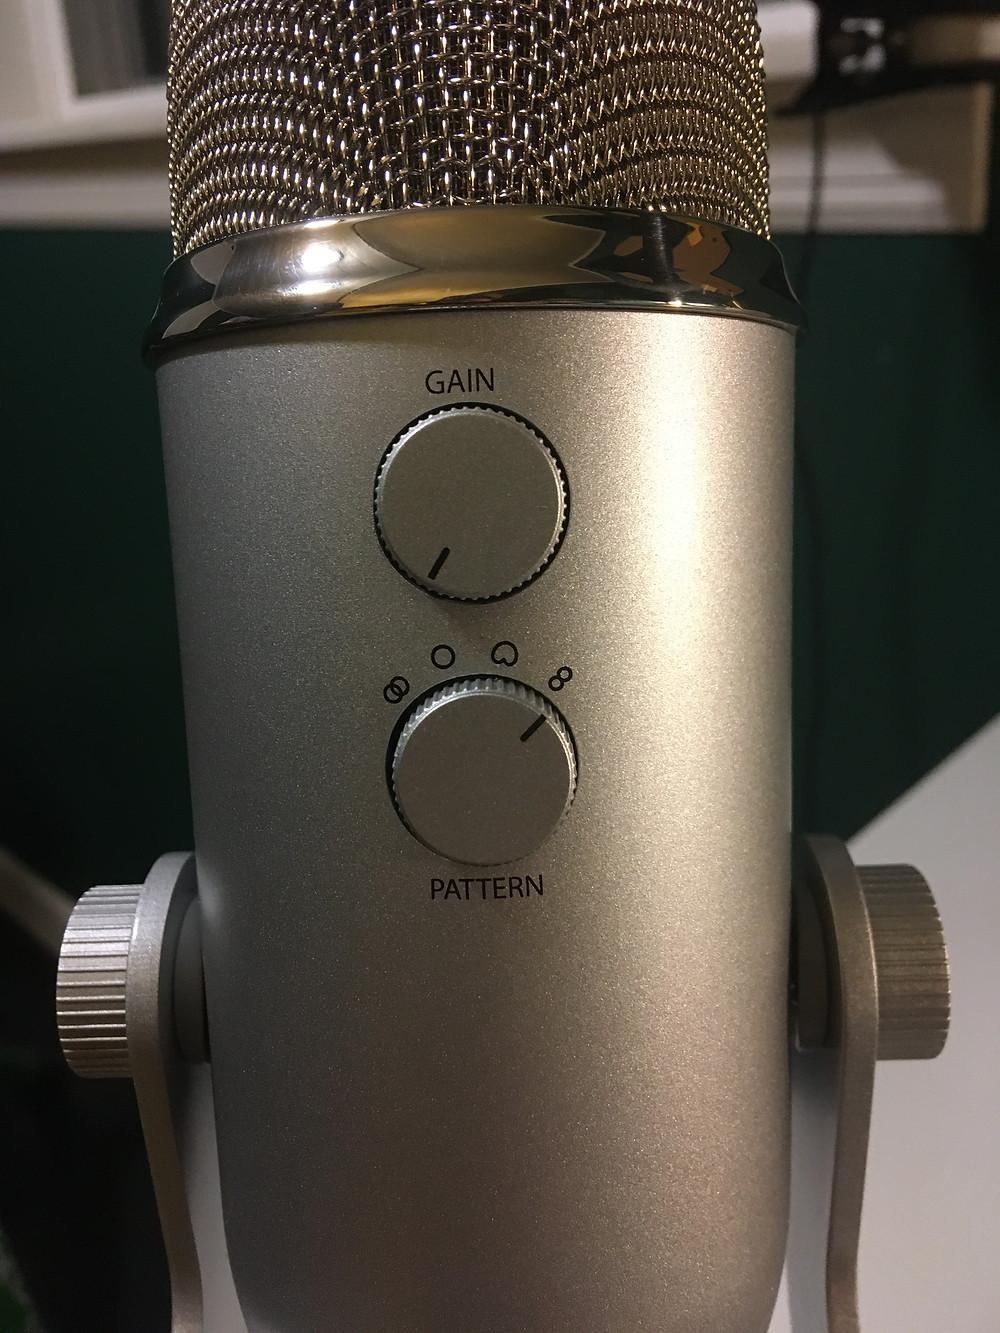 Blue Yeti Microphone